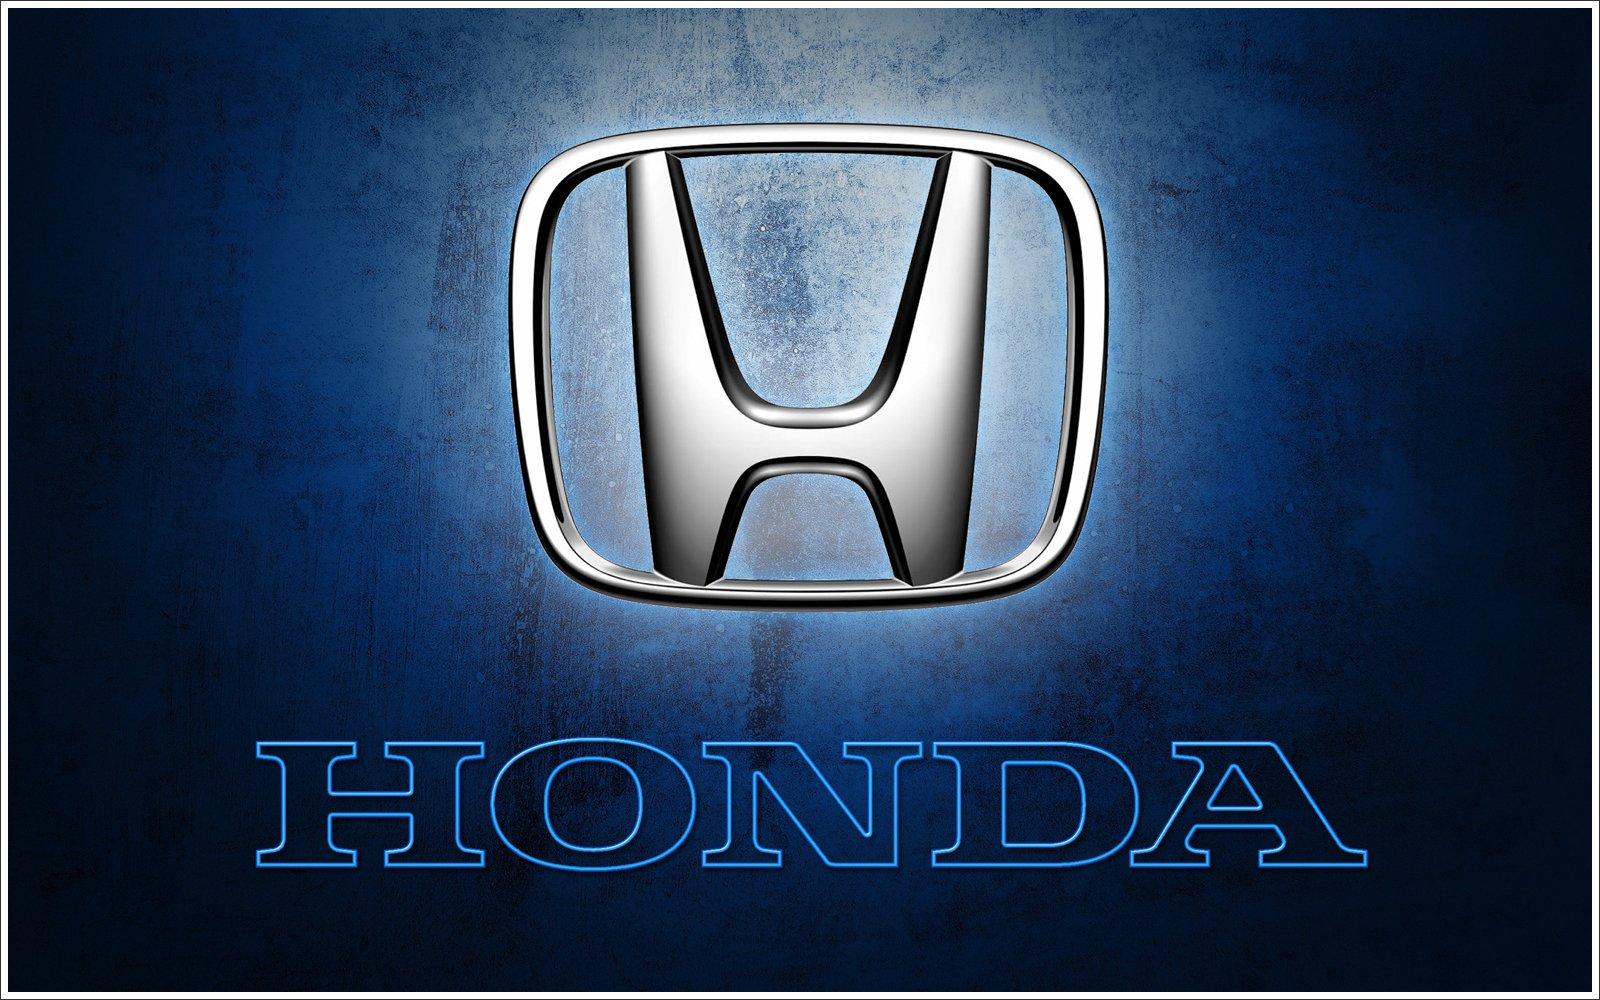 Honda Logo Meaning And History Symbol Honda World Cars Brands